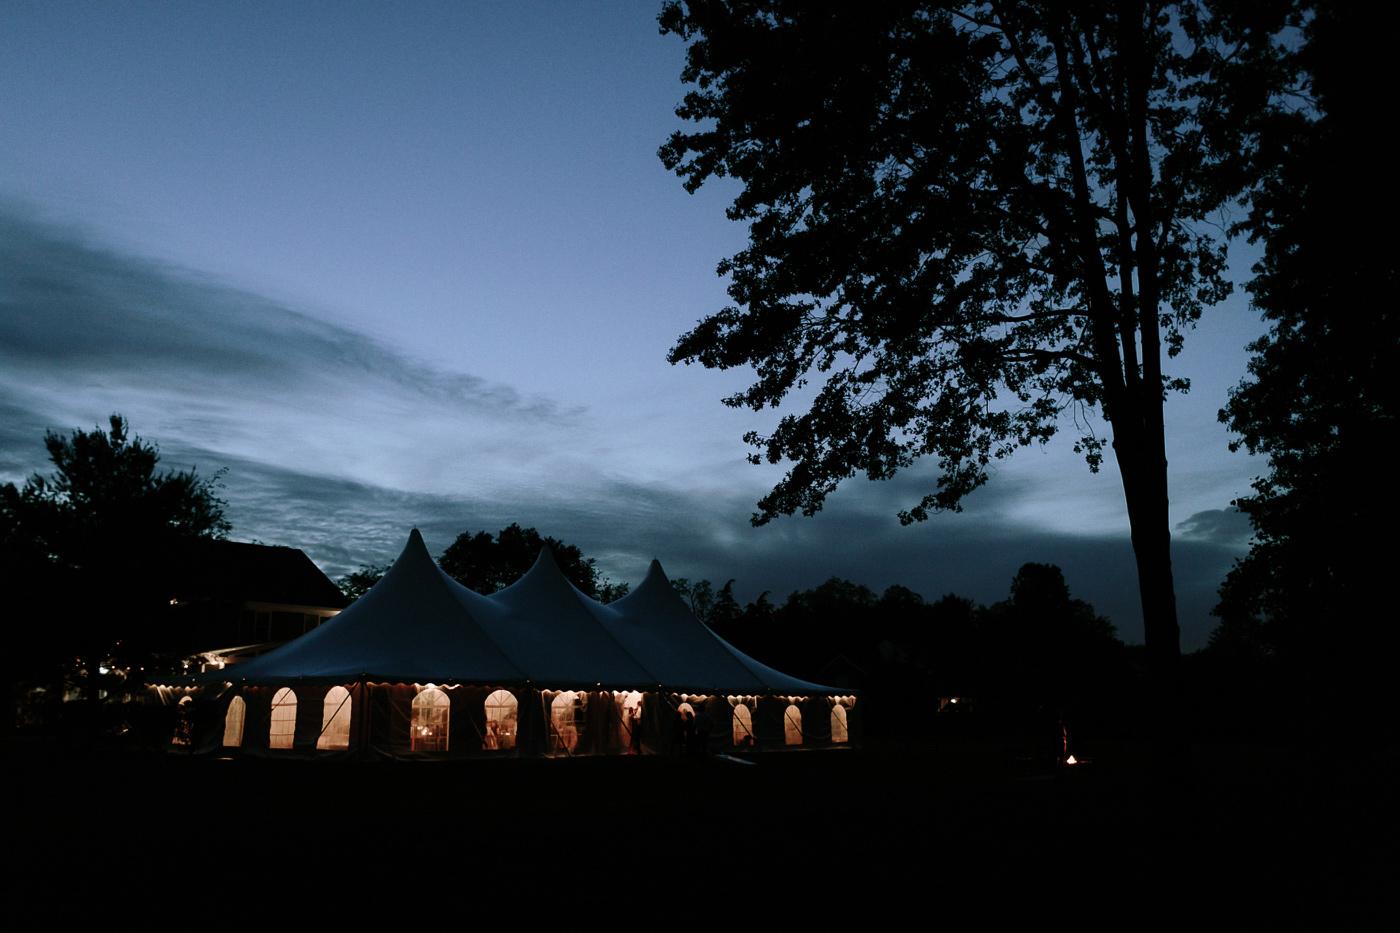 Backyard wedding reception at dusk